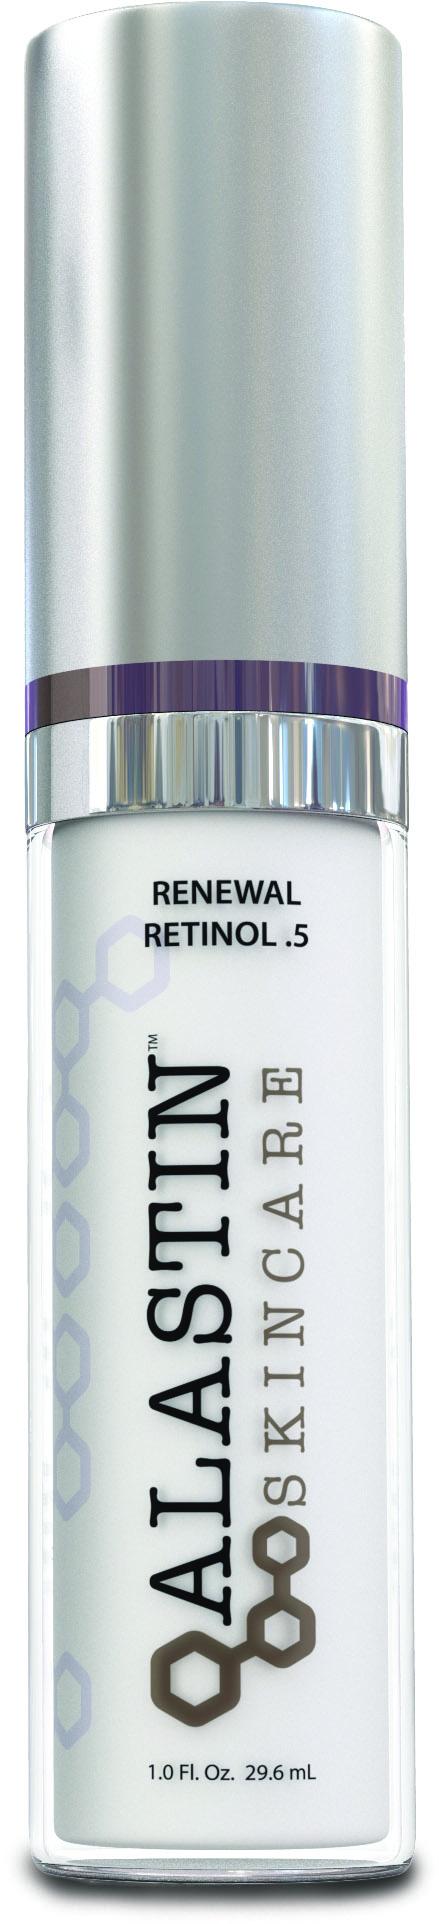 renewal retinol .5